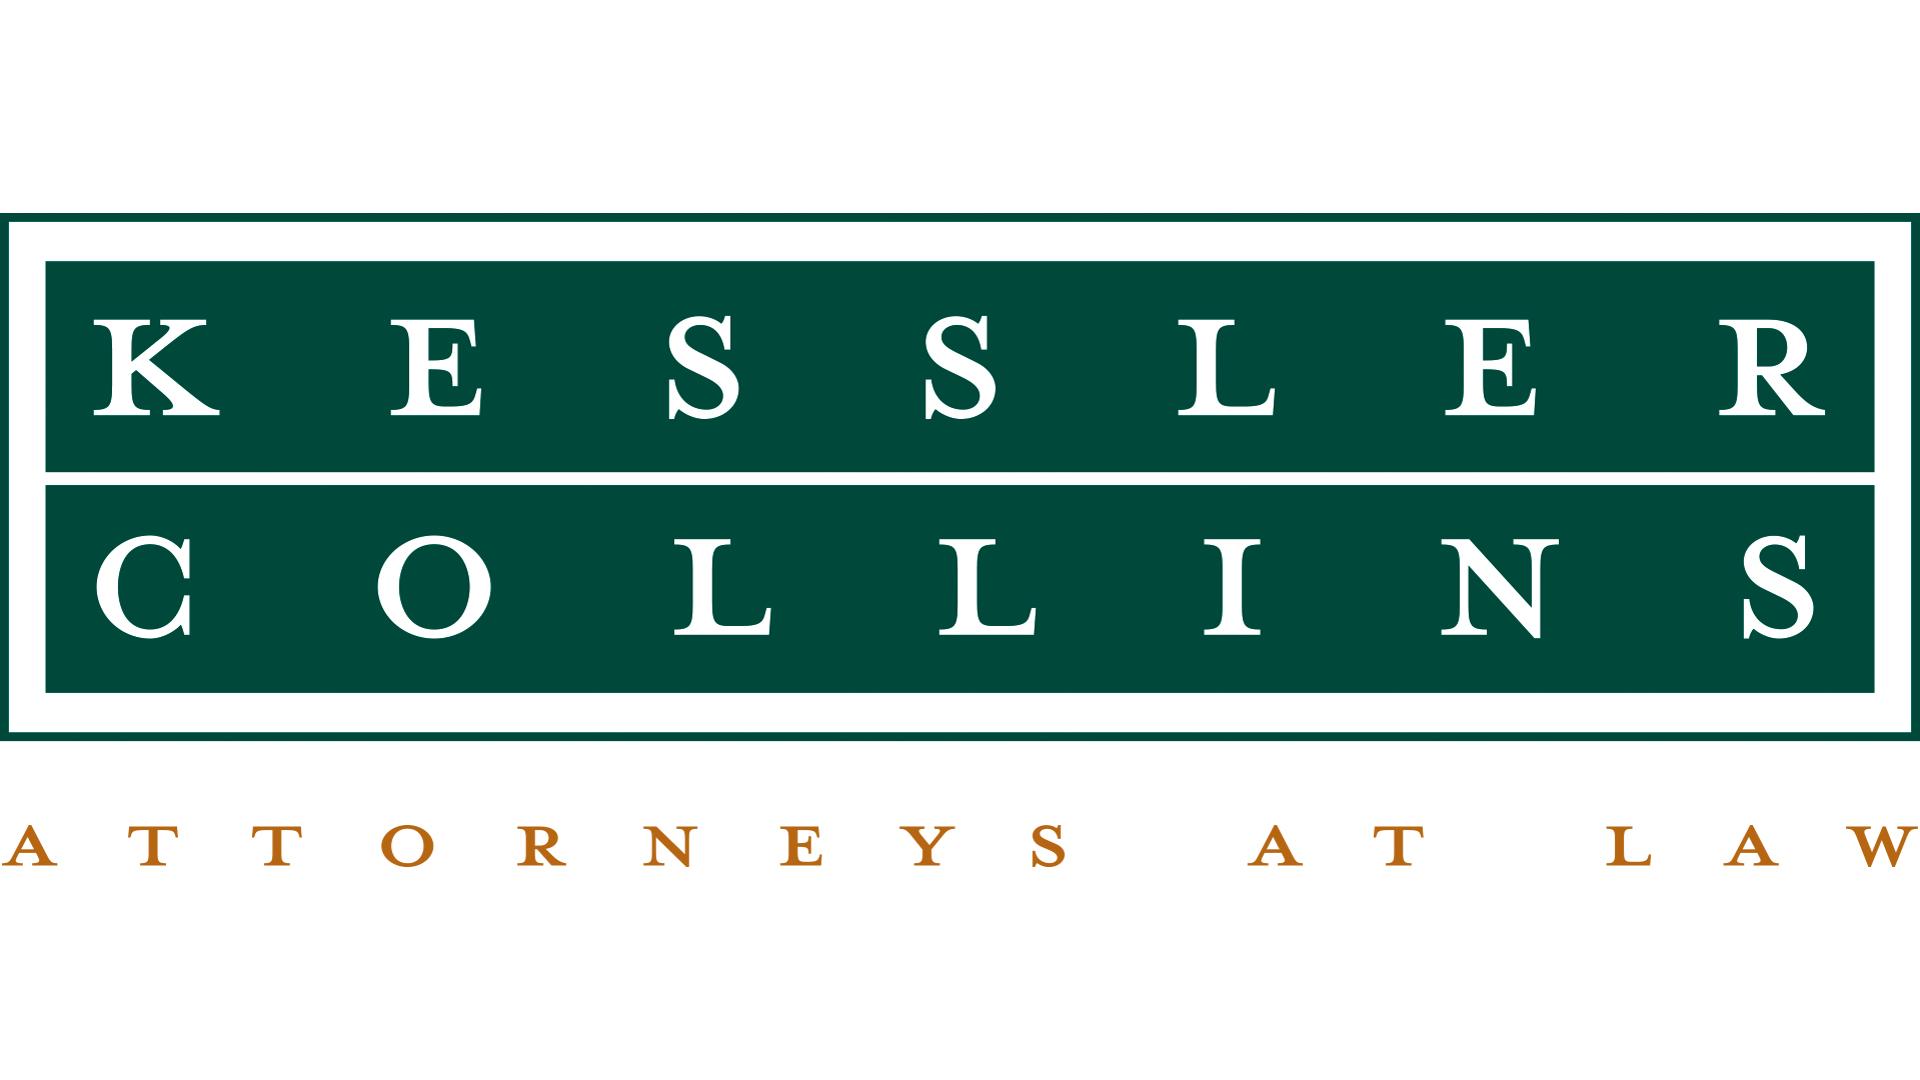 Kessler Collins P.C. logo